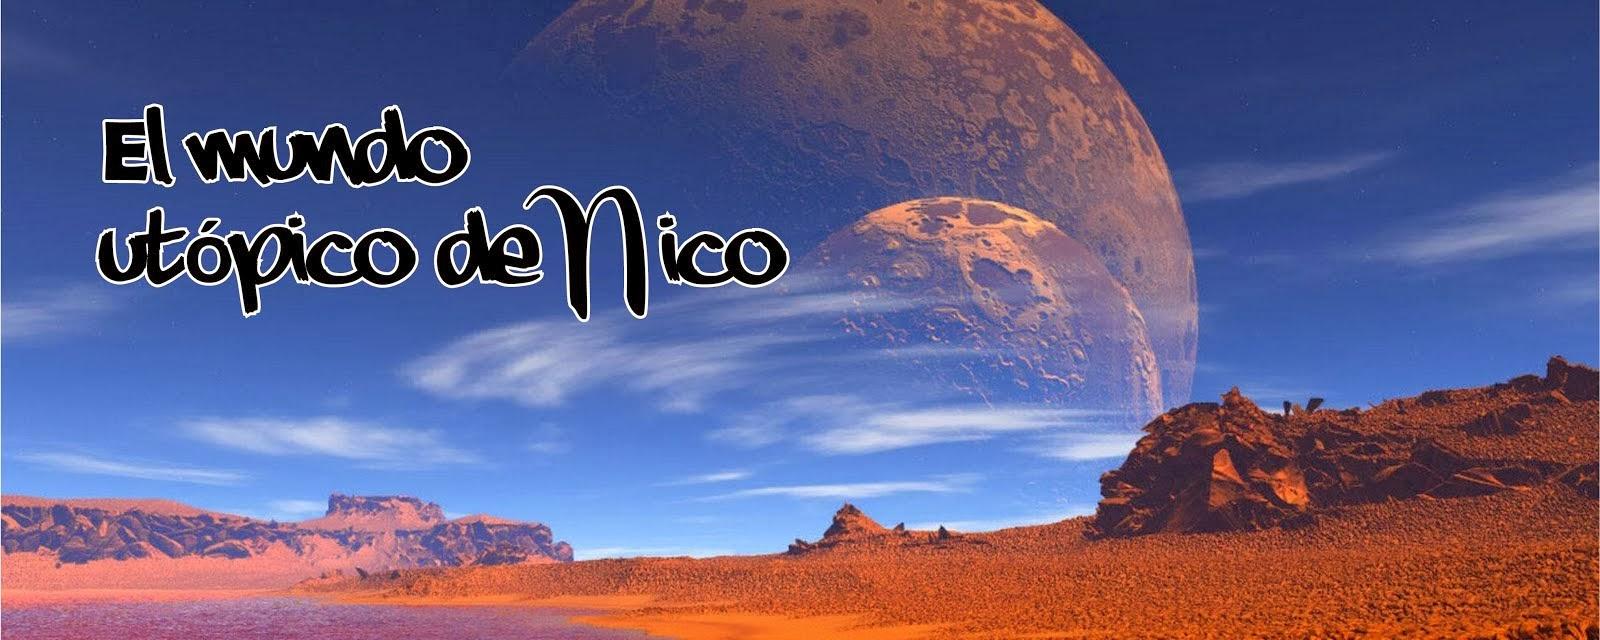 El mundo utópico de Nico